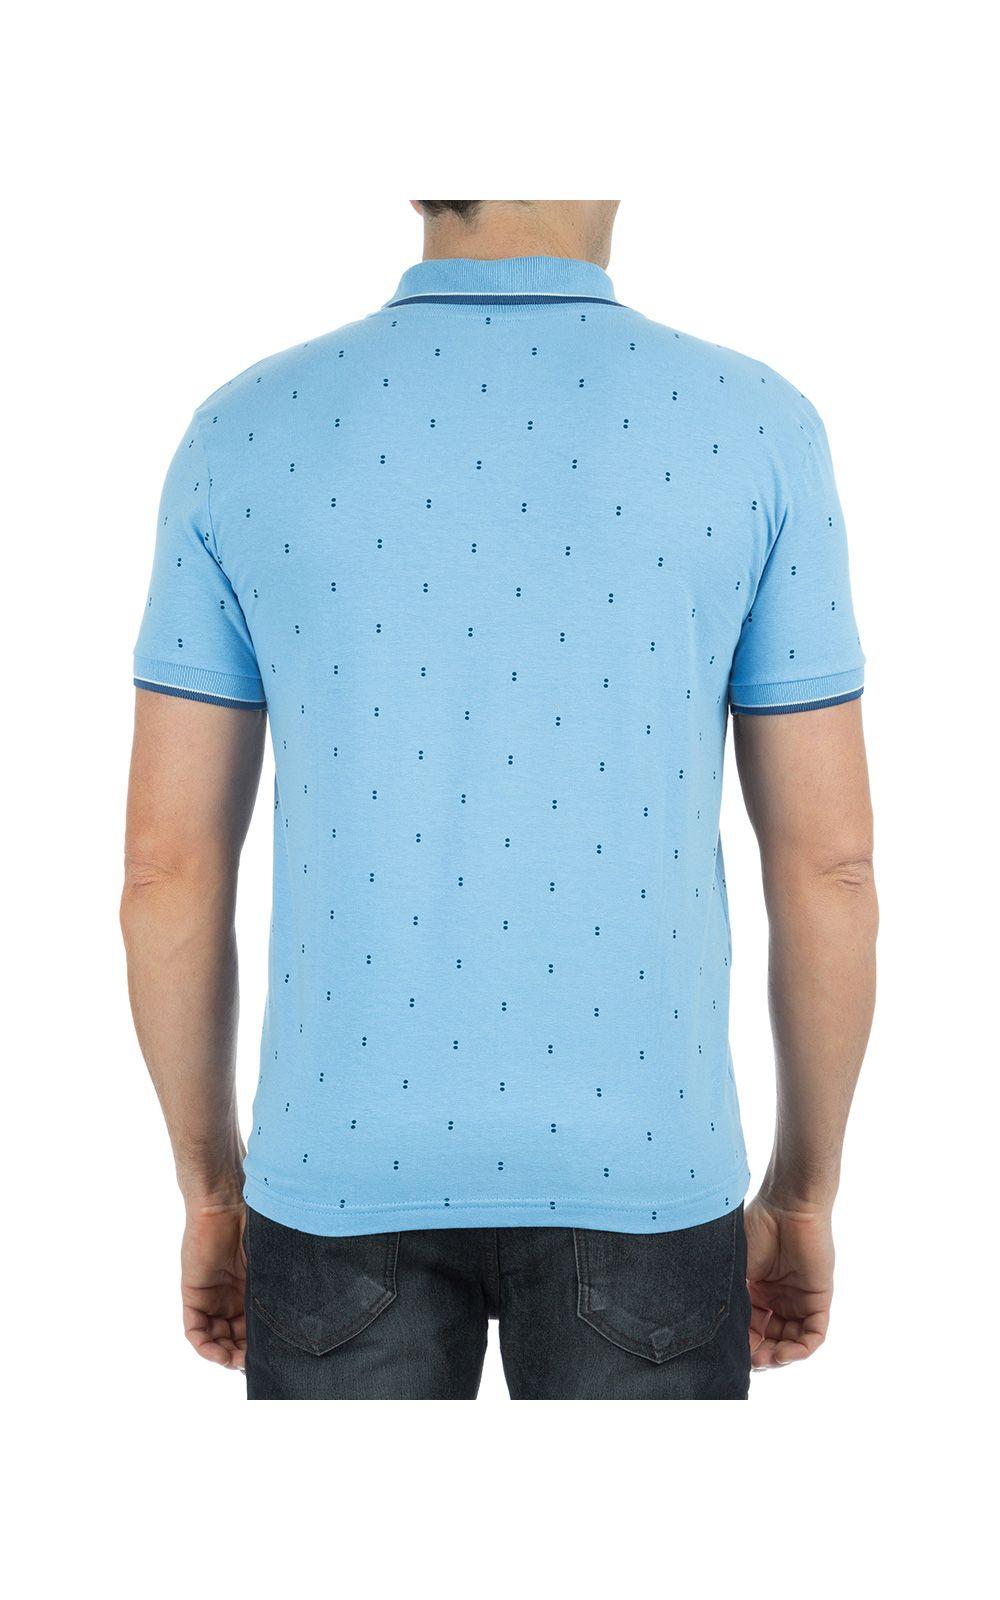 Foto 2 - Camisa Polo Masculina Azul Claro Estampada